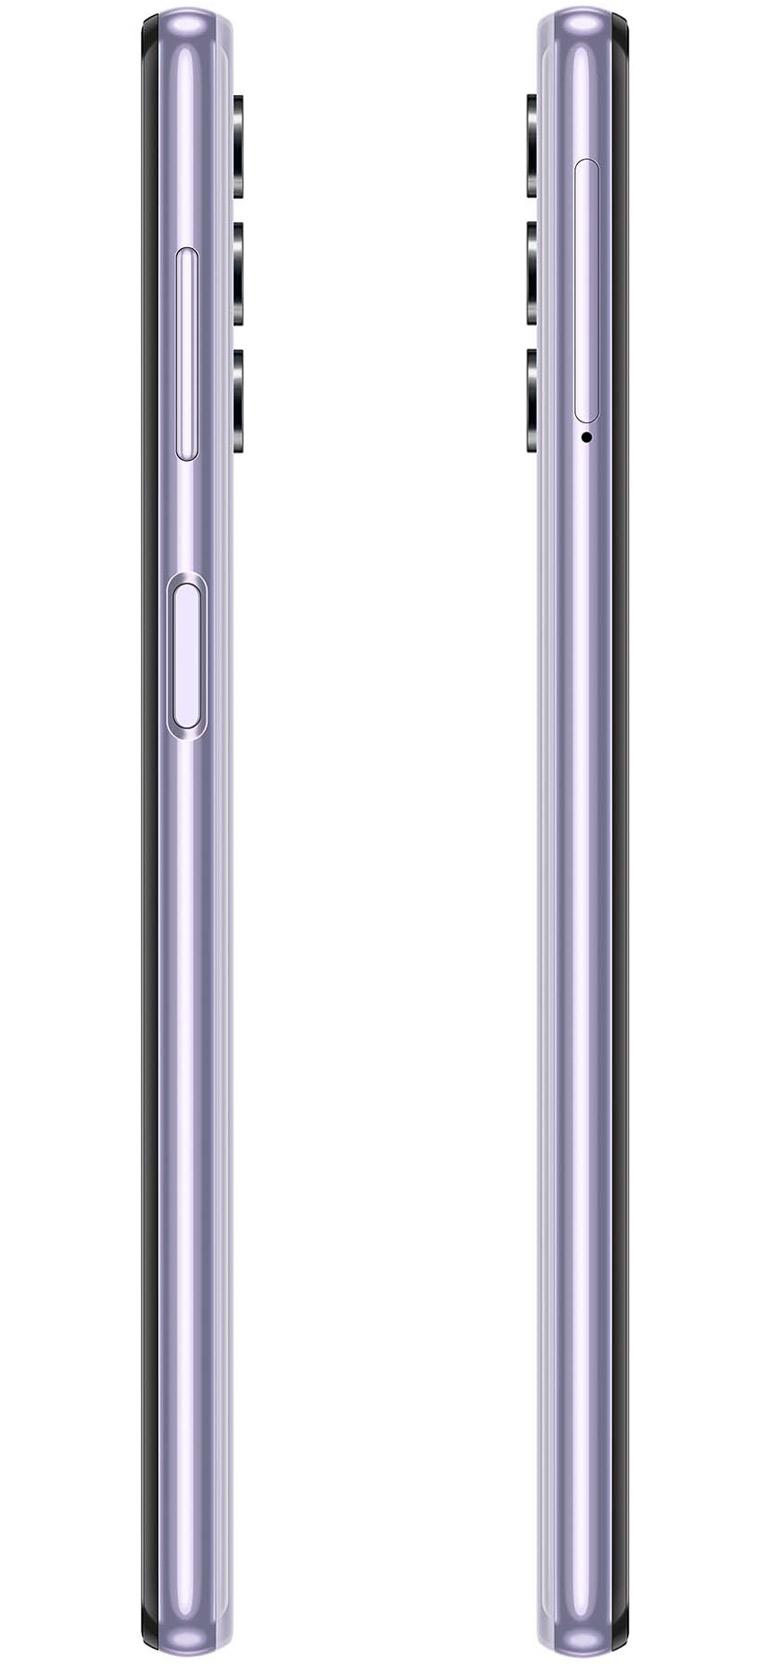 Samsung Galaxy A32 DS (SM-A325) 128GB Violet - 6